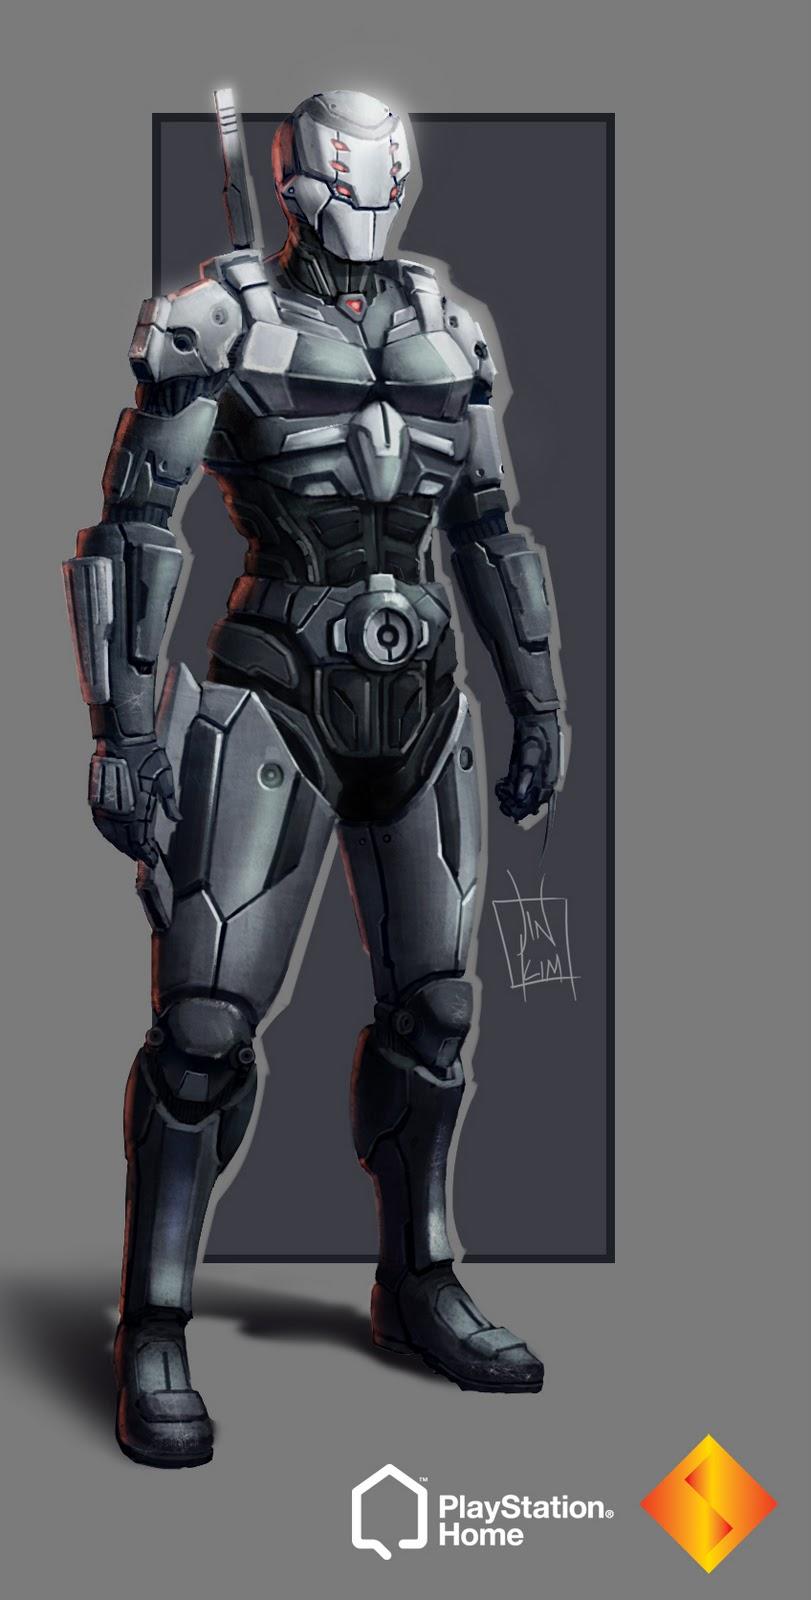 Future Ninja Armor Cyber Future Ninja 12Futuristic Ninja Armor